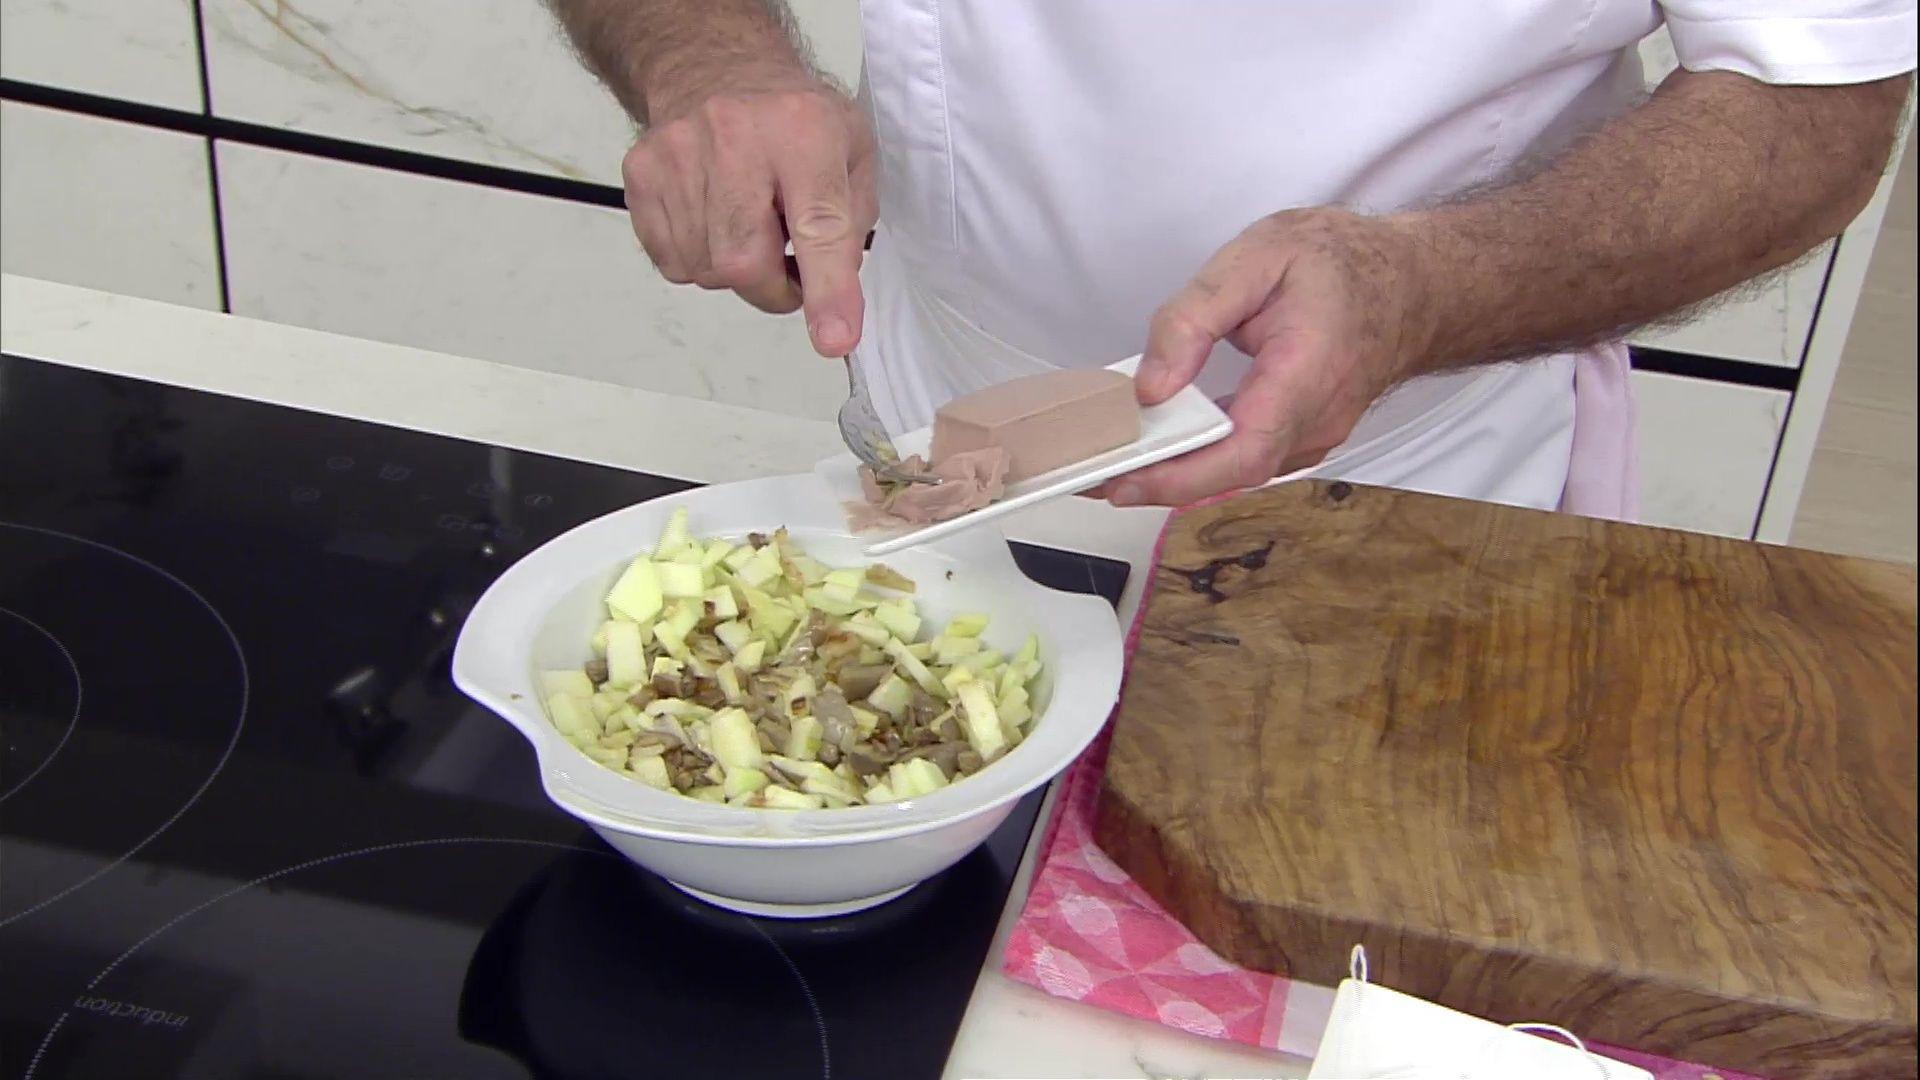 Aleta rellena de hortalizas, setas y mousse de ave